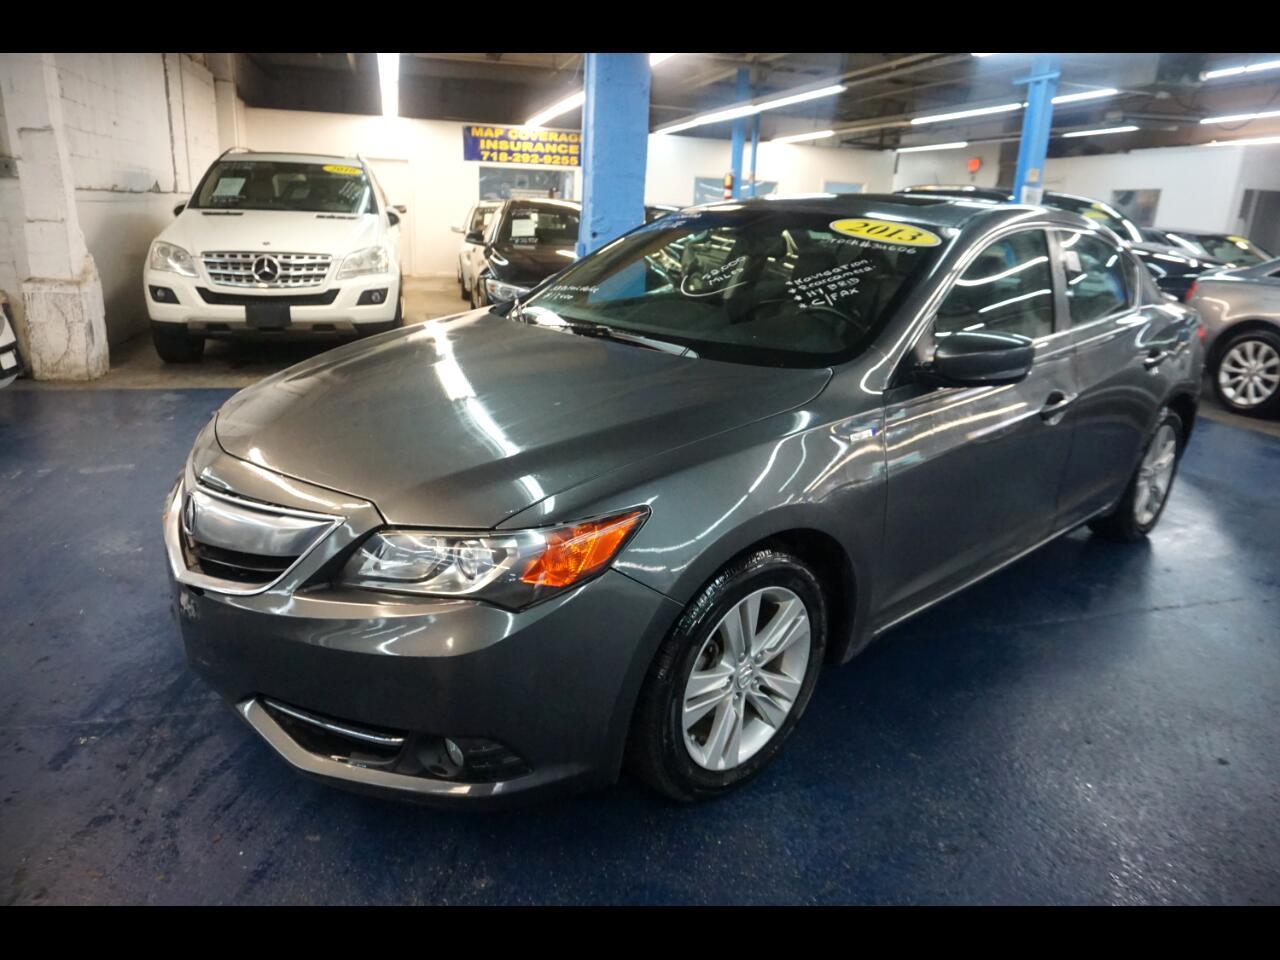 2013 Acura ILX 4dr Sdn 1.5L Hybrid Tech Pkg